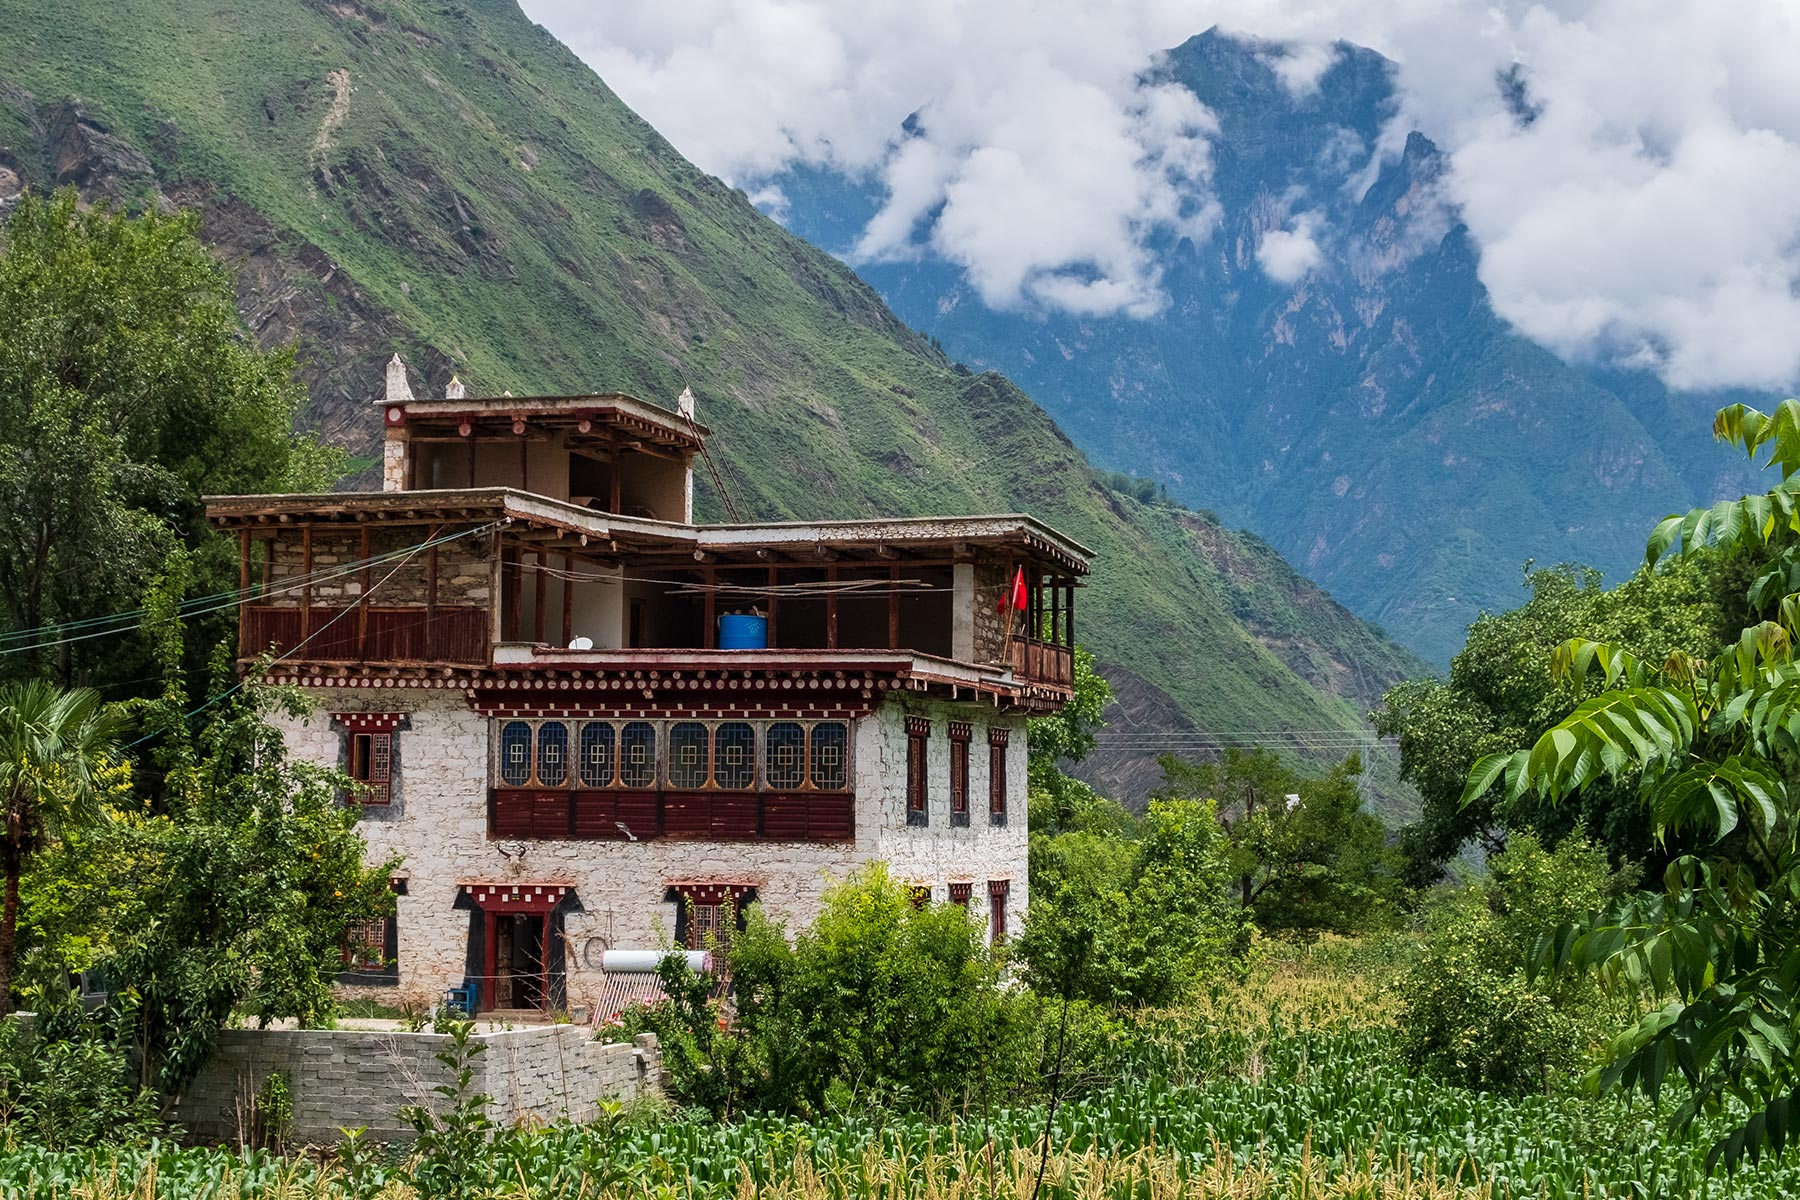 Gebäude im tibetischen Dorf Danba Zangzhai in China